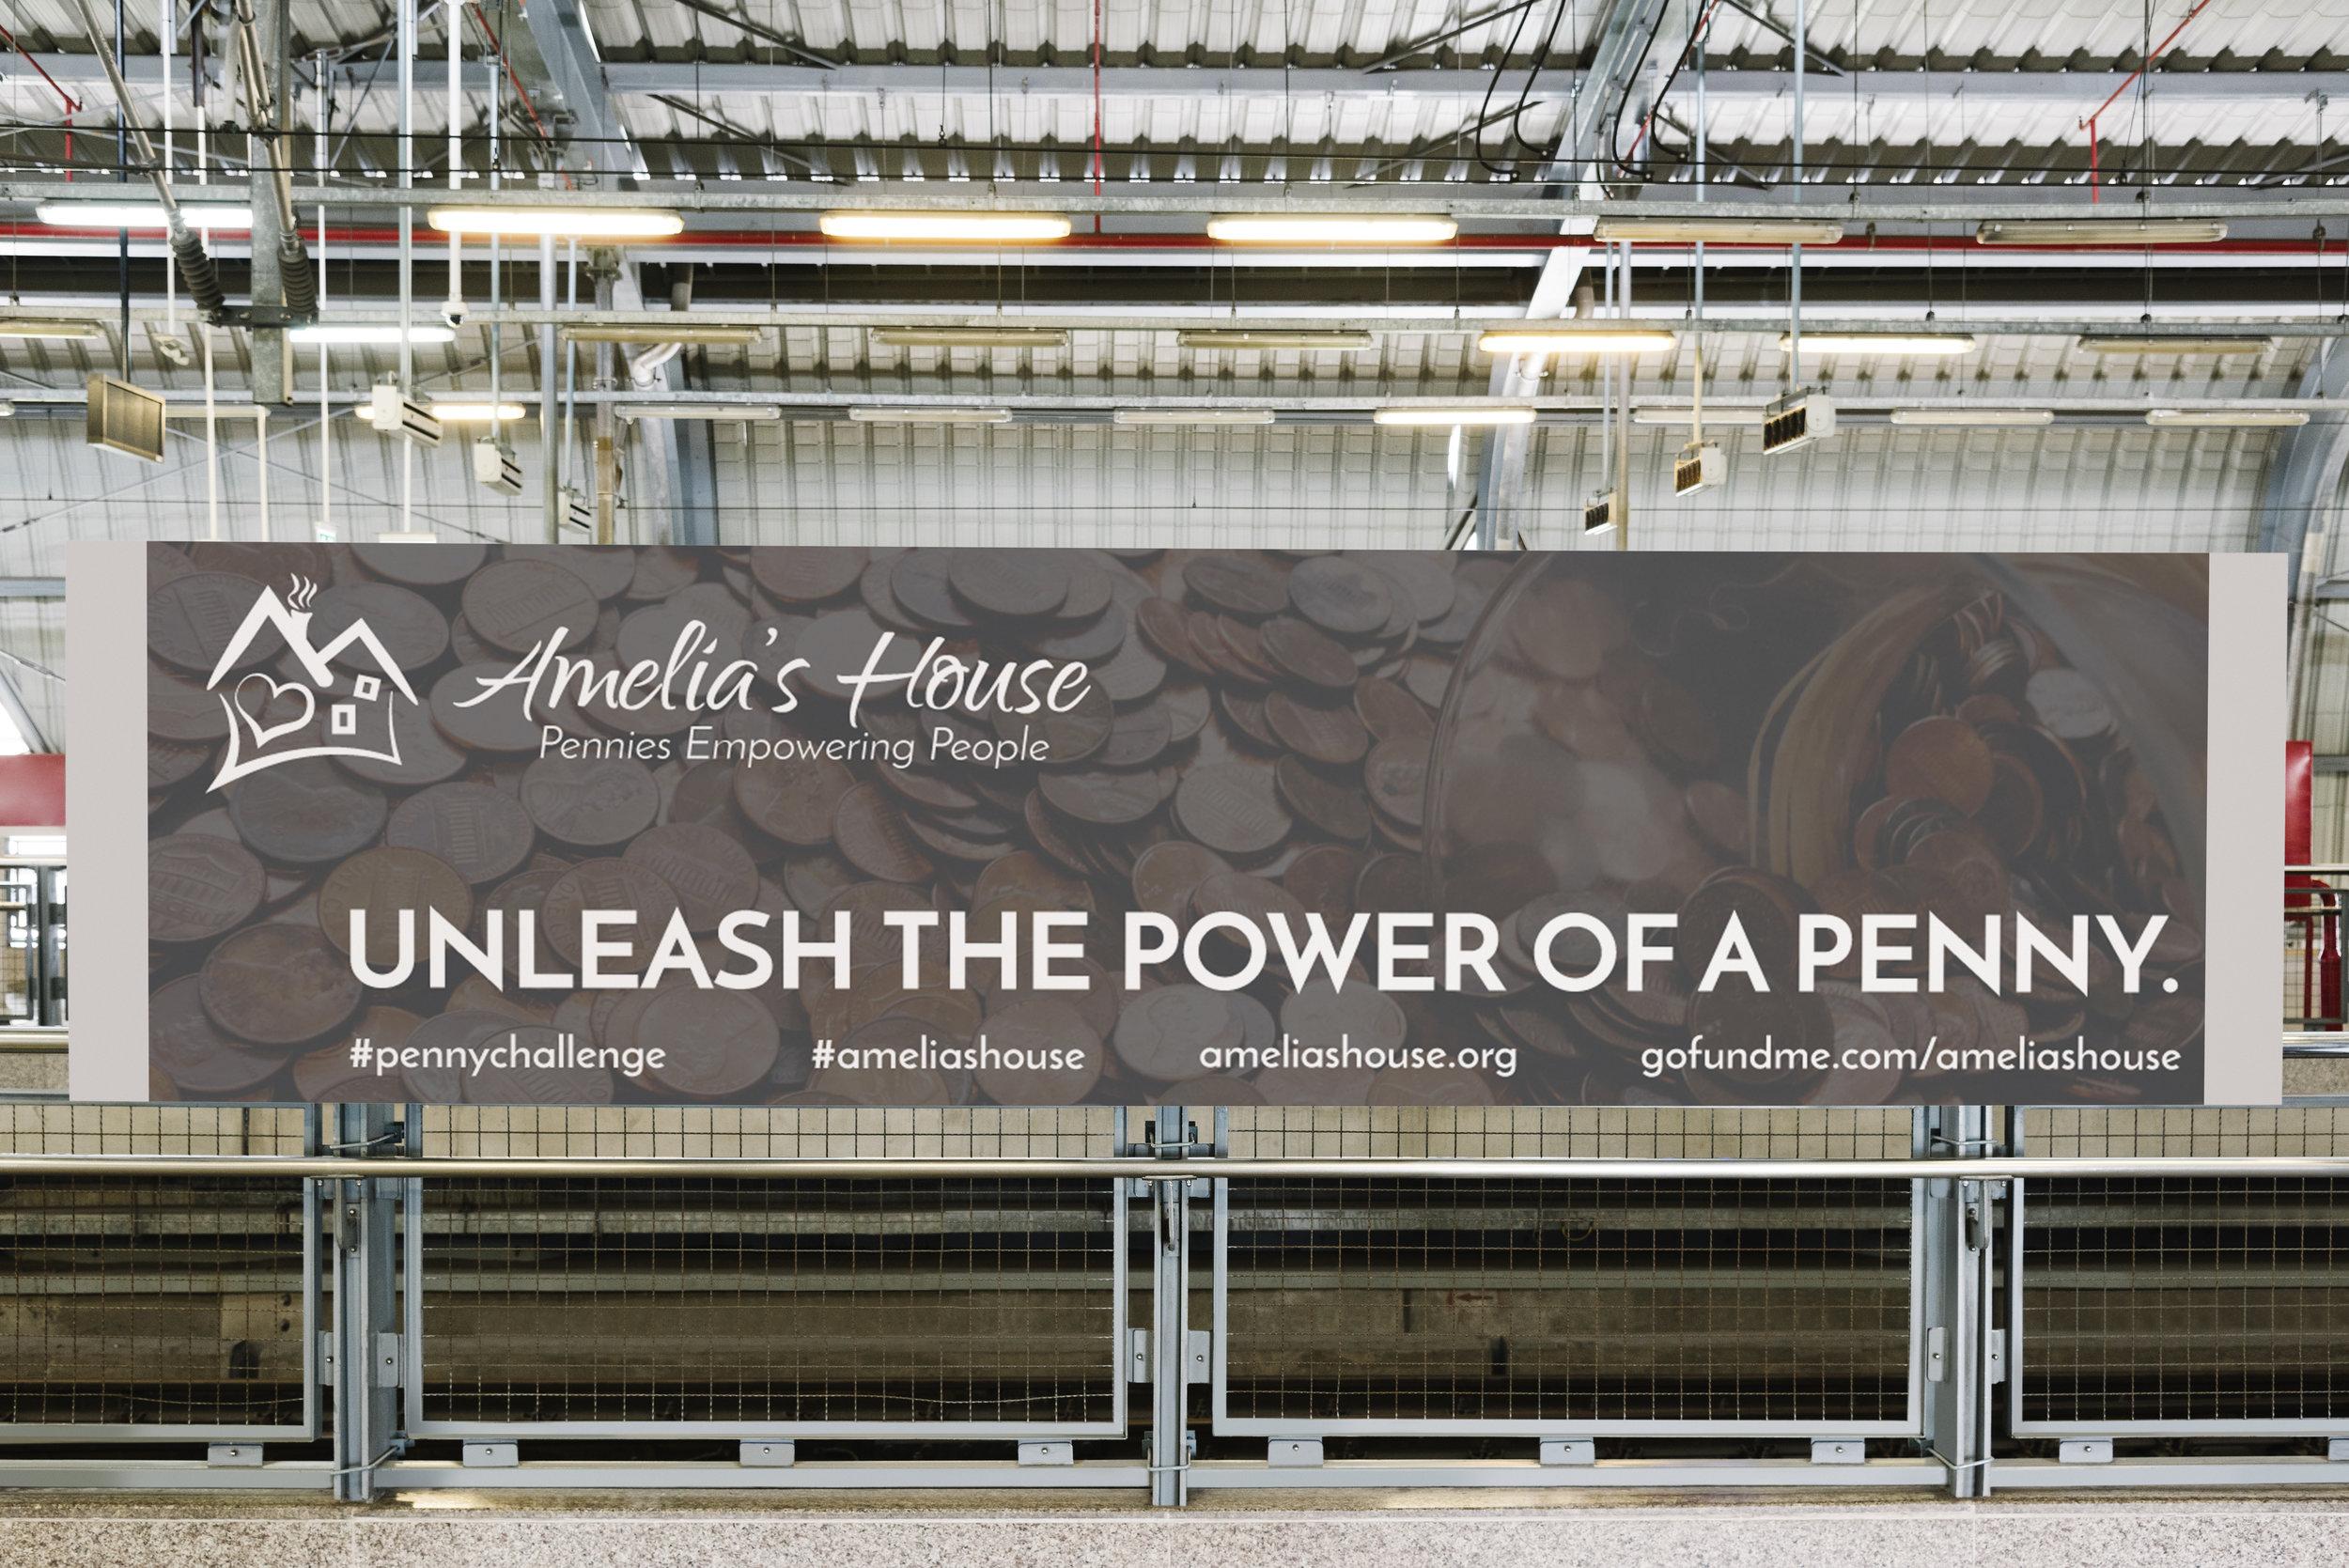 Amelias House Billboard Mockup.jpg